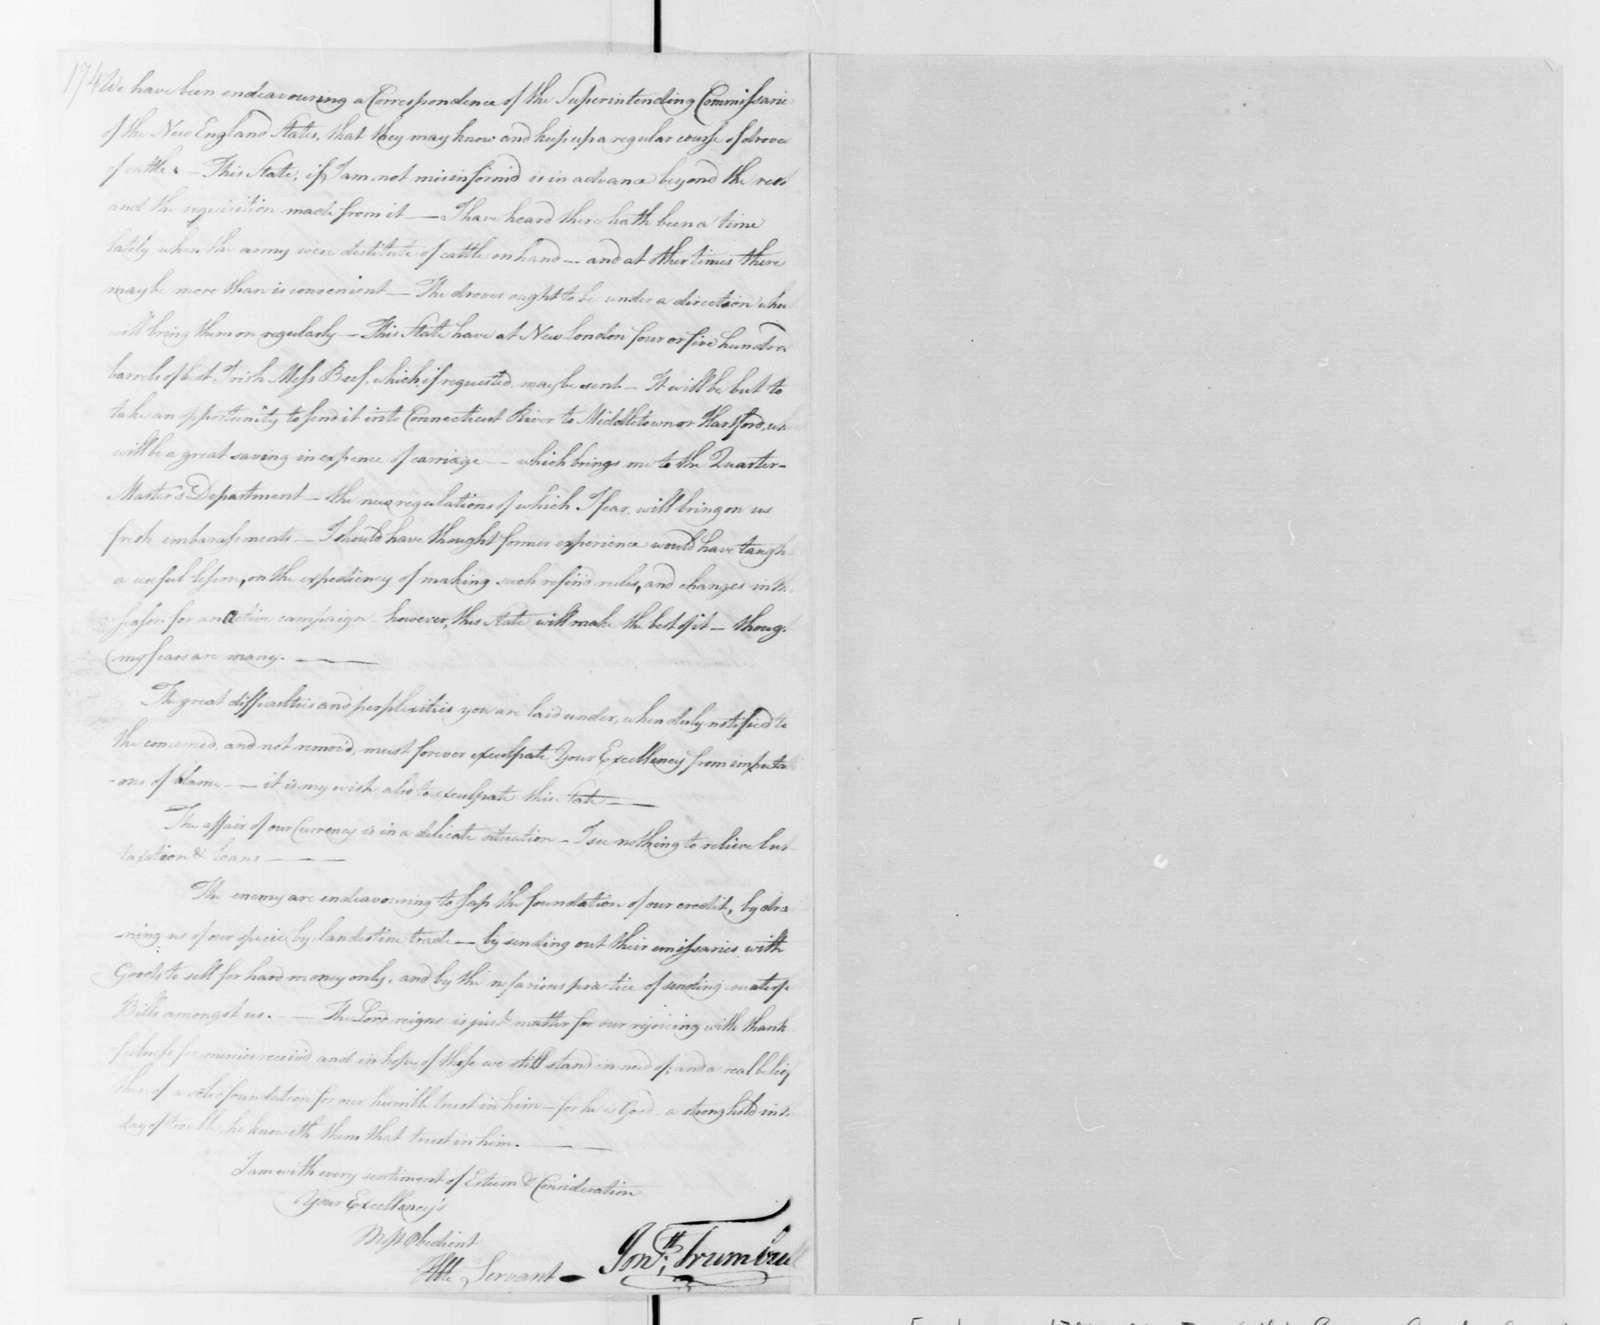 George Washington Papers, Series 4, General Correspondence: Jonathan Trumbull to George Washington, August 31, 1780